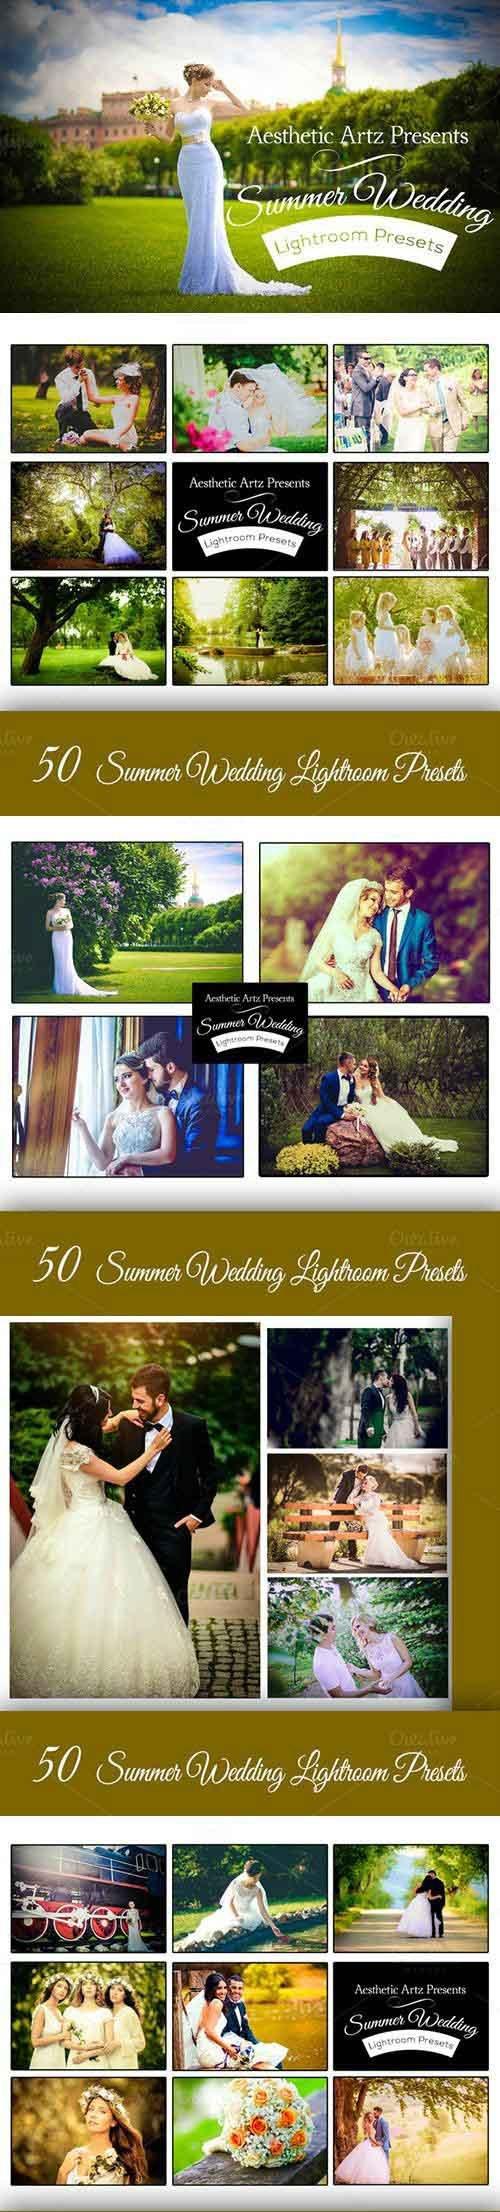 50 Summer Wedding Lightroom Workflow